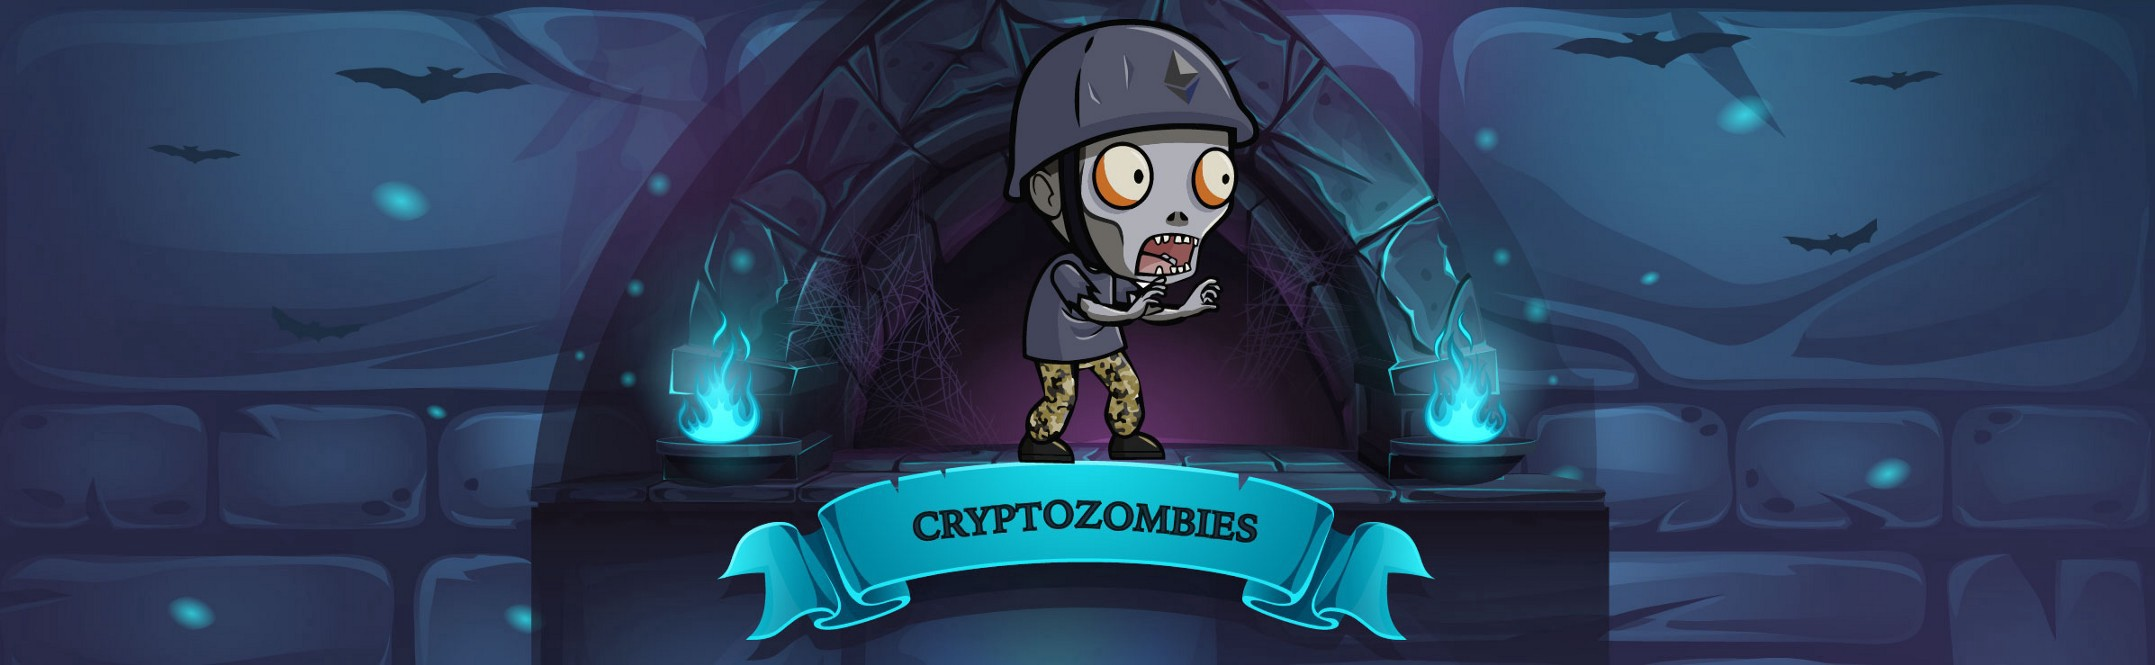 cryptozombies - 加密僵尸